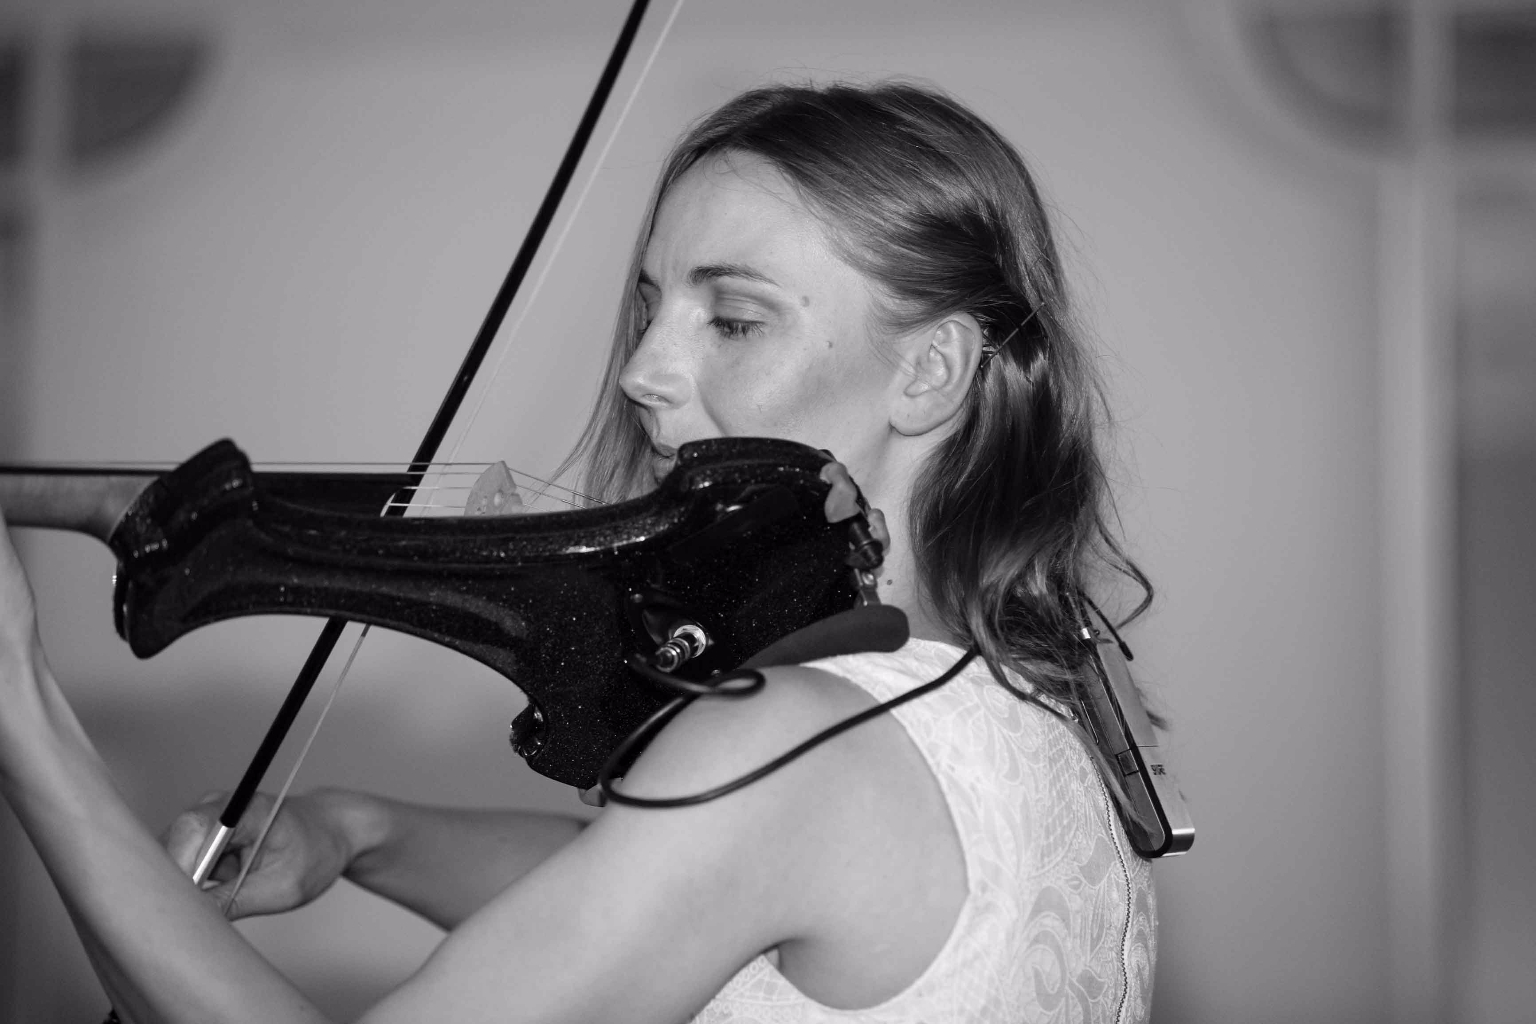 violinista london fashion kick